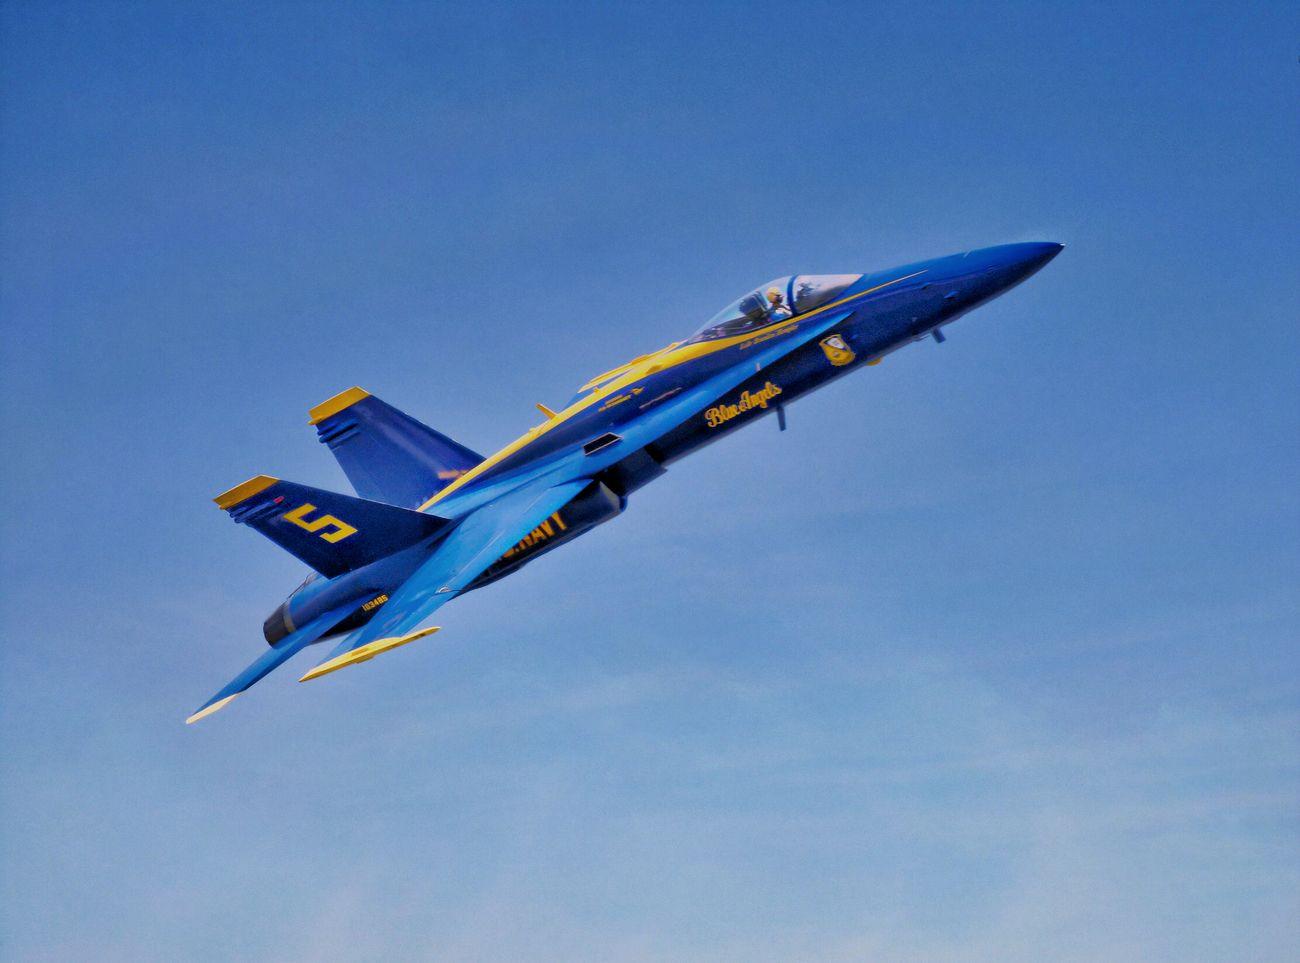 Taken near the Naval Aviation Museum in Pensacola, FL - 06.11.19